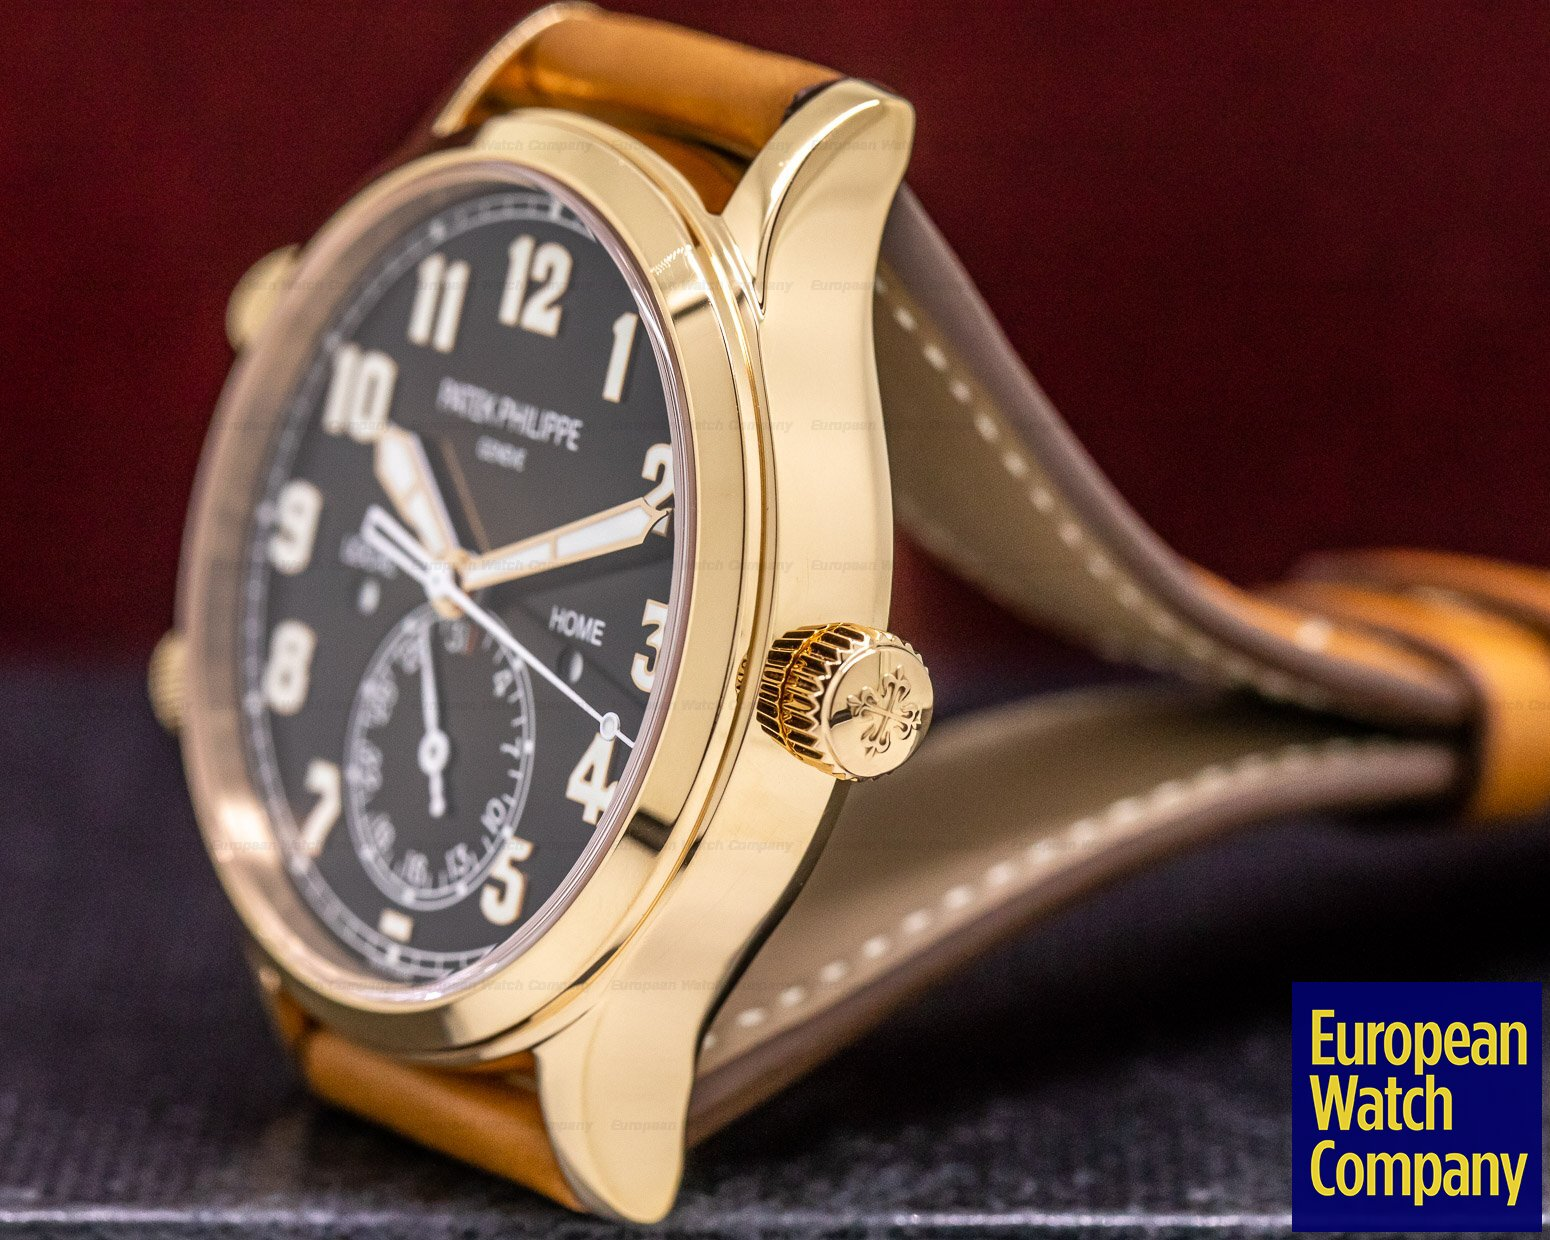 Patek Philippe 5524R-001 Calatrava Pilot Travel Time 18k Rose Gold